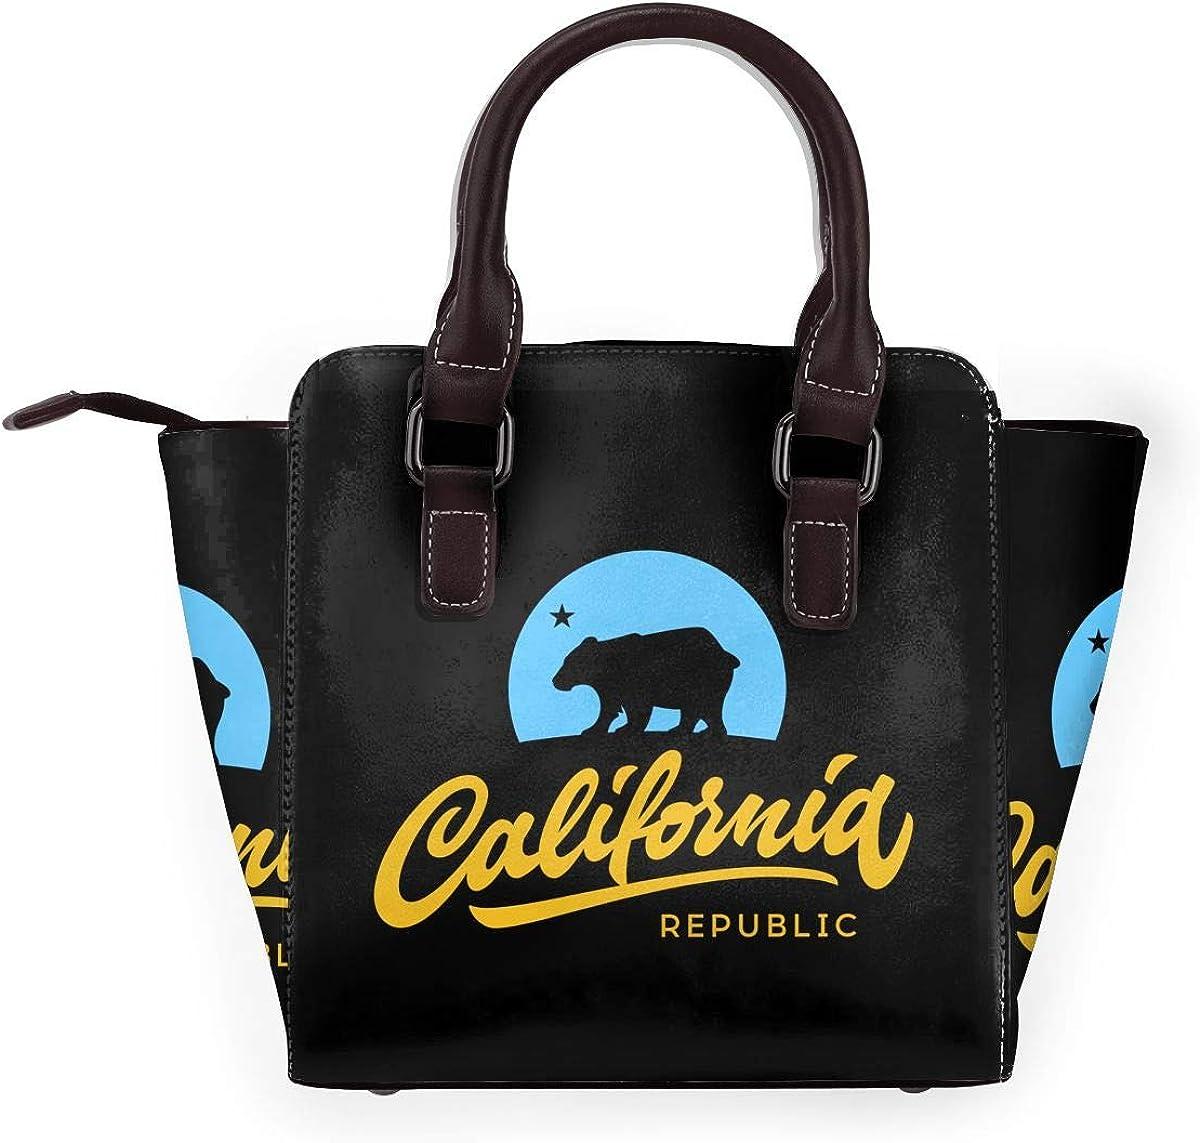 Craifish Sac à main en cuir véritable pour filles Retro California Republic